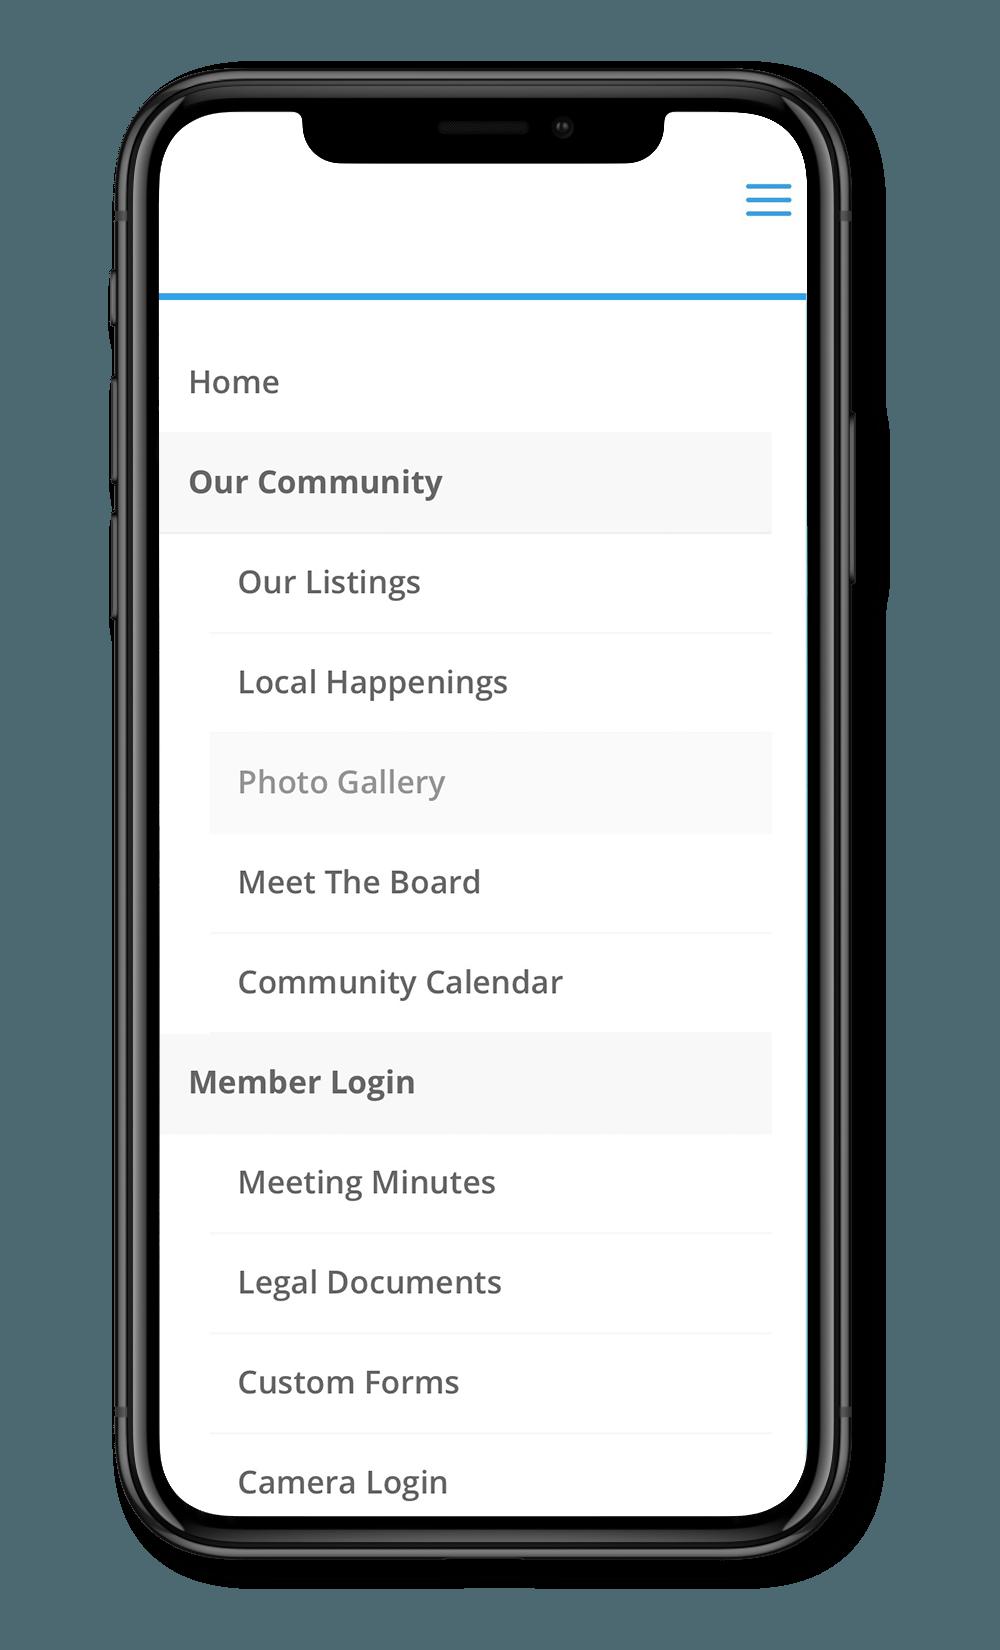 condo website navigation menu